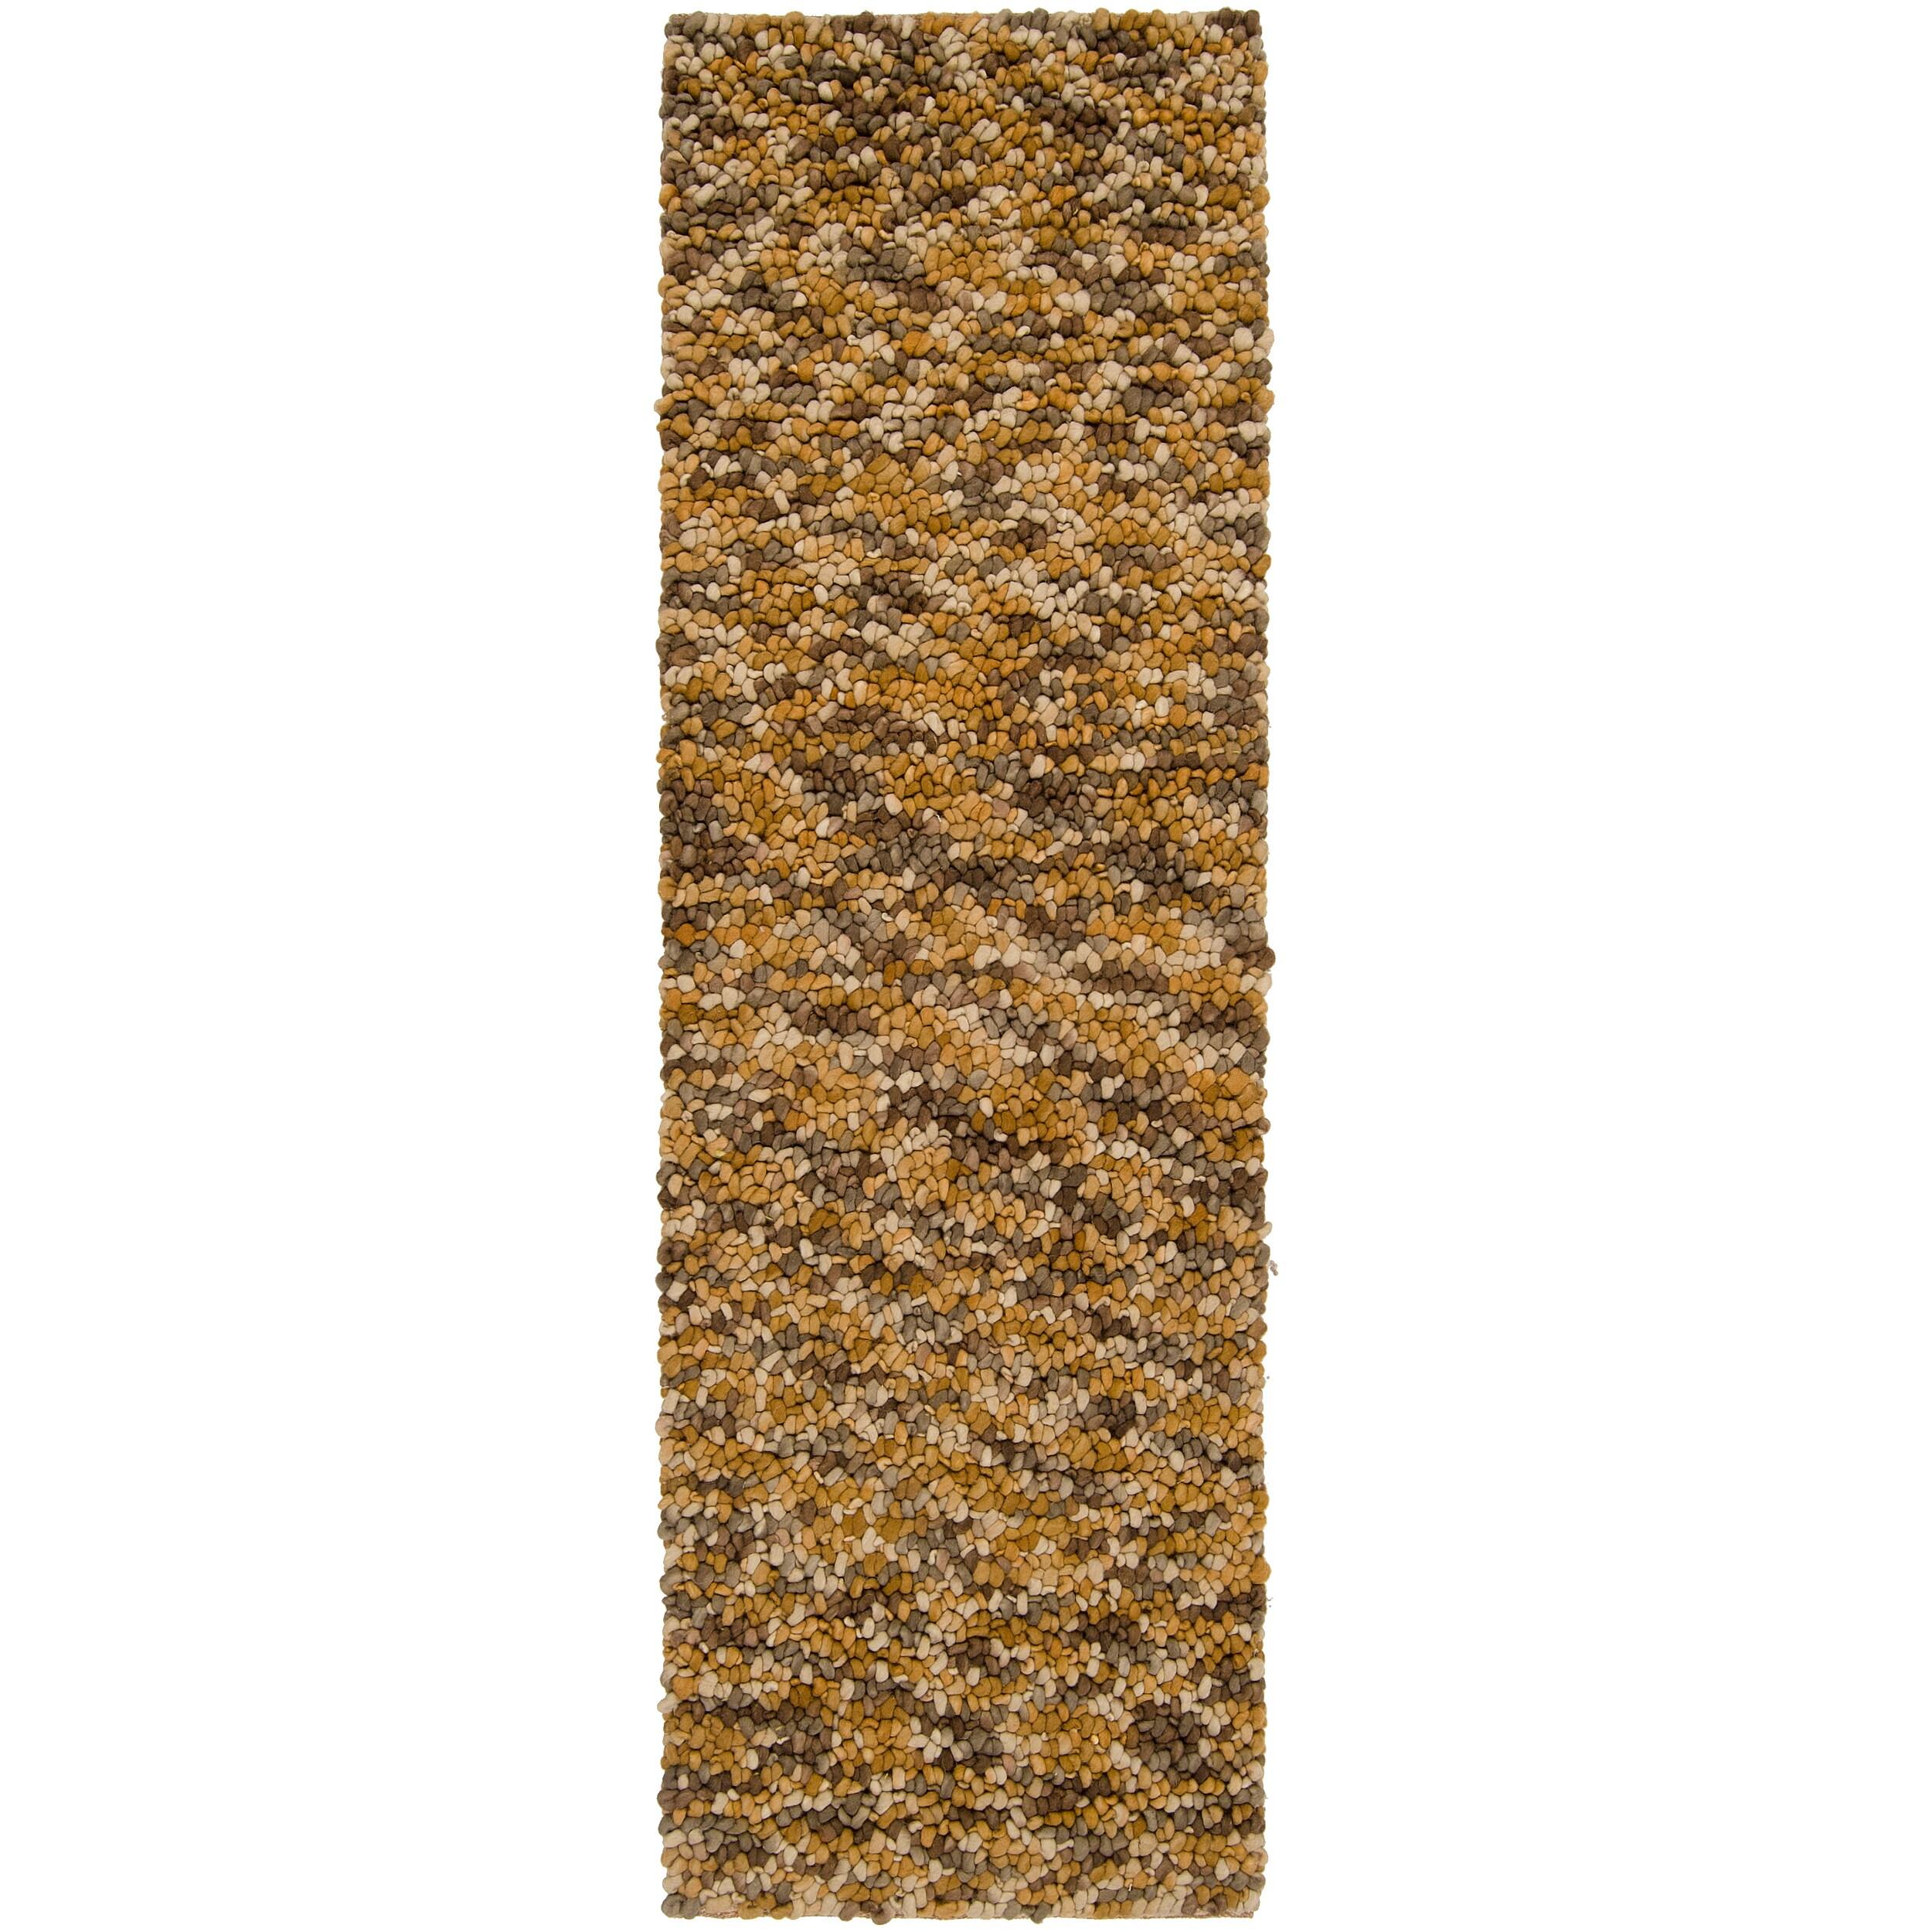 Hand-woven Gold Arracacha New Zealand Wool Plush Shag Rug (2'6 x 8')